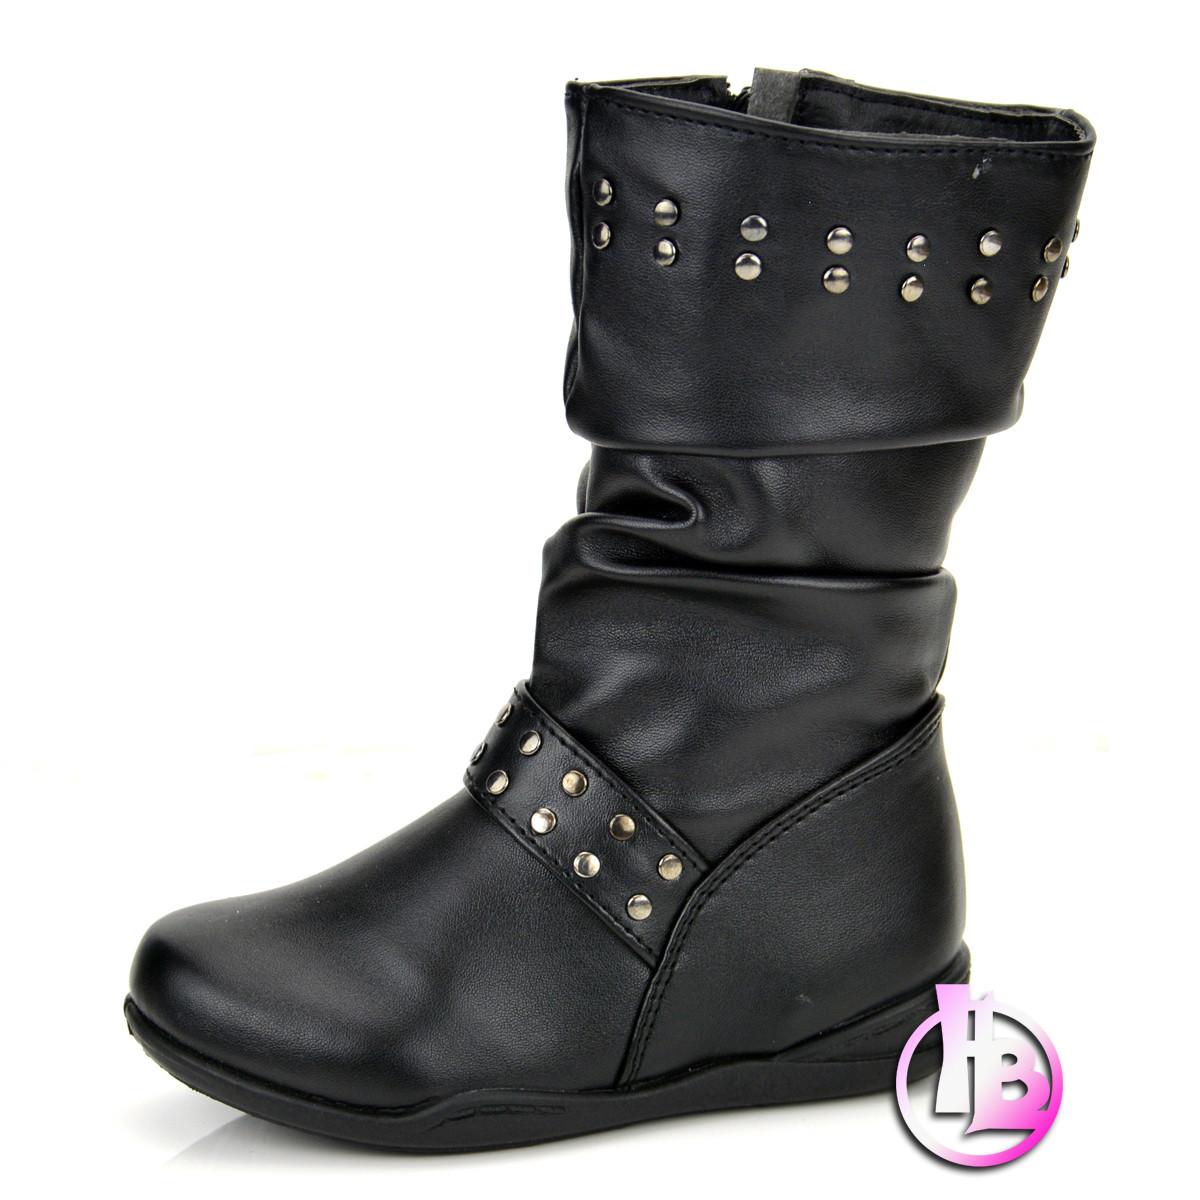 girls mid calf boots designer winter shoe size 4 5 6 7 8 9